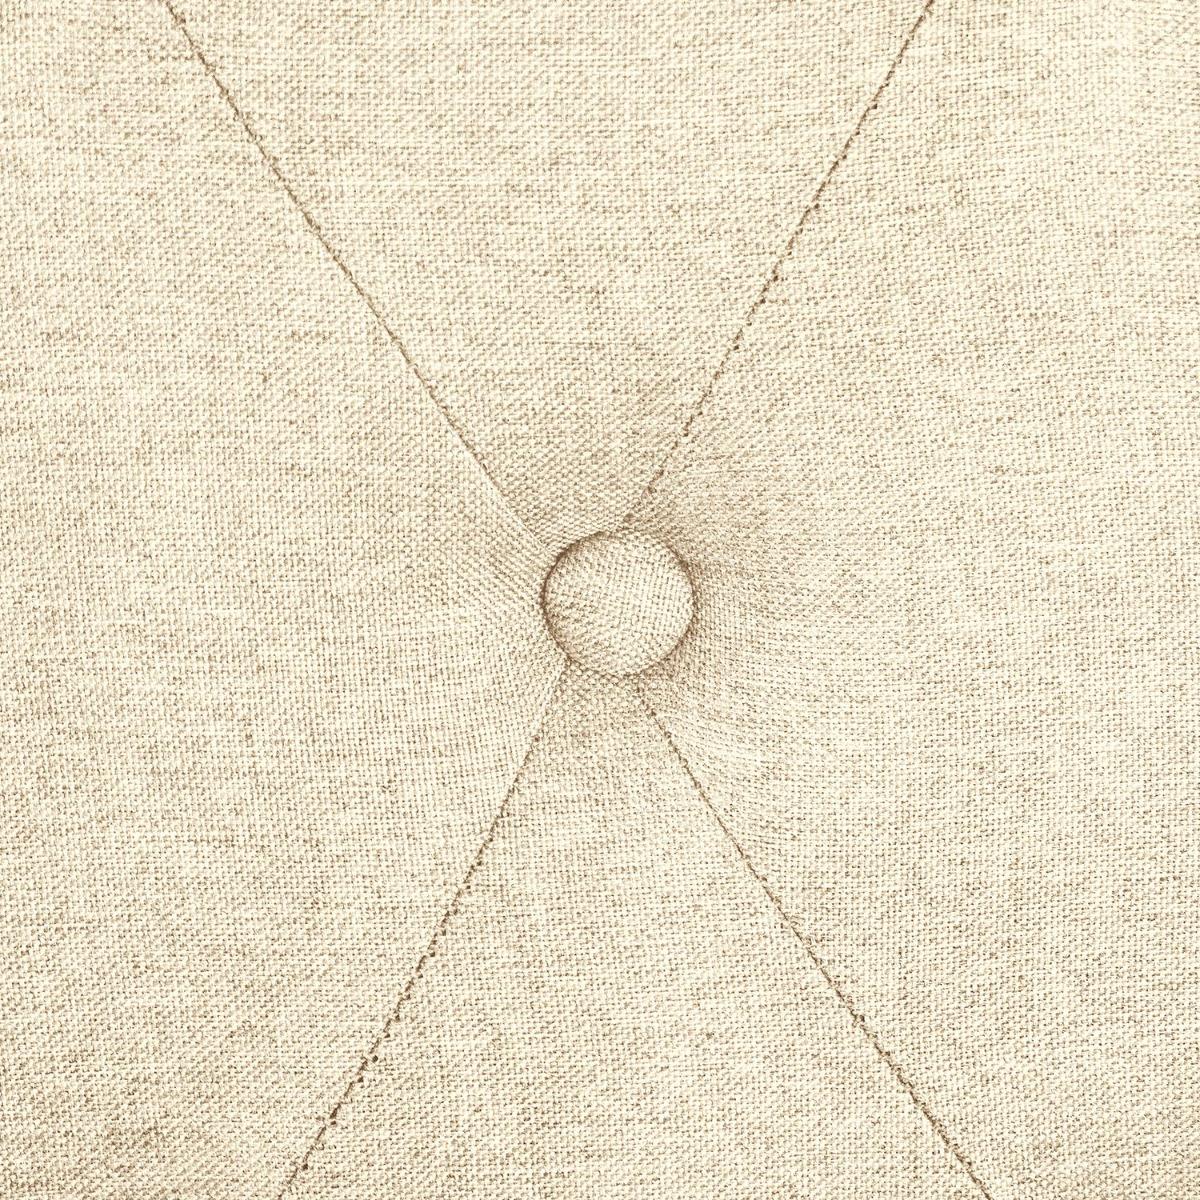 Hermione hoofdeinde 160 cm wit hout en beige stof